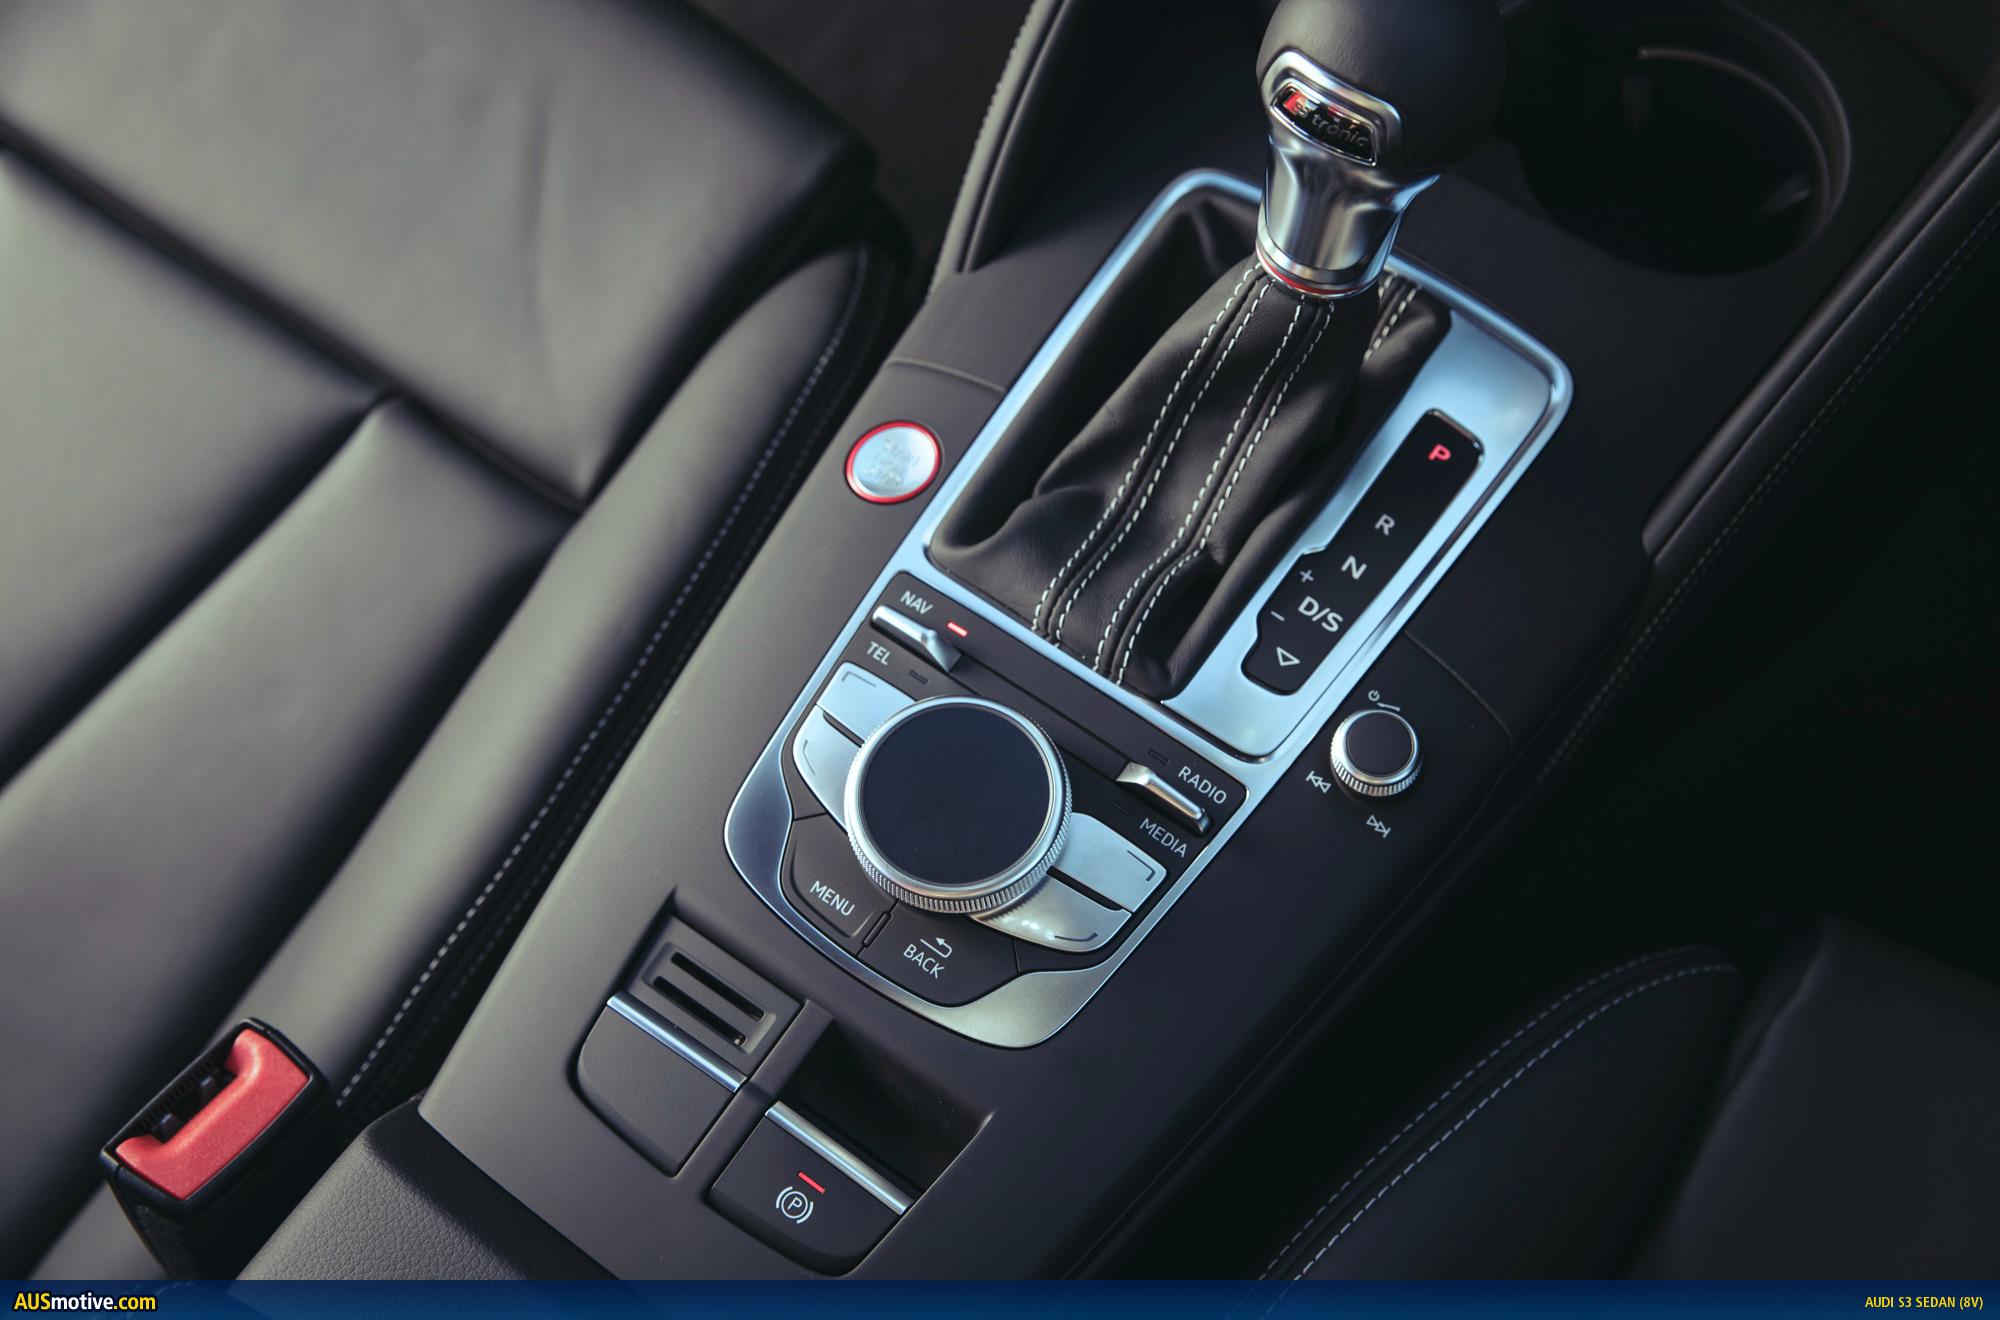 AUSmotive.com » Audi S3 sedan - Australian pricing & specs